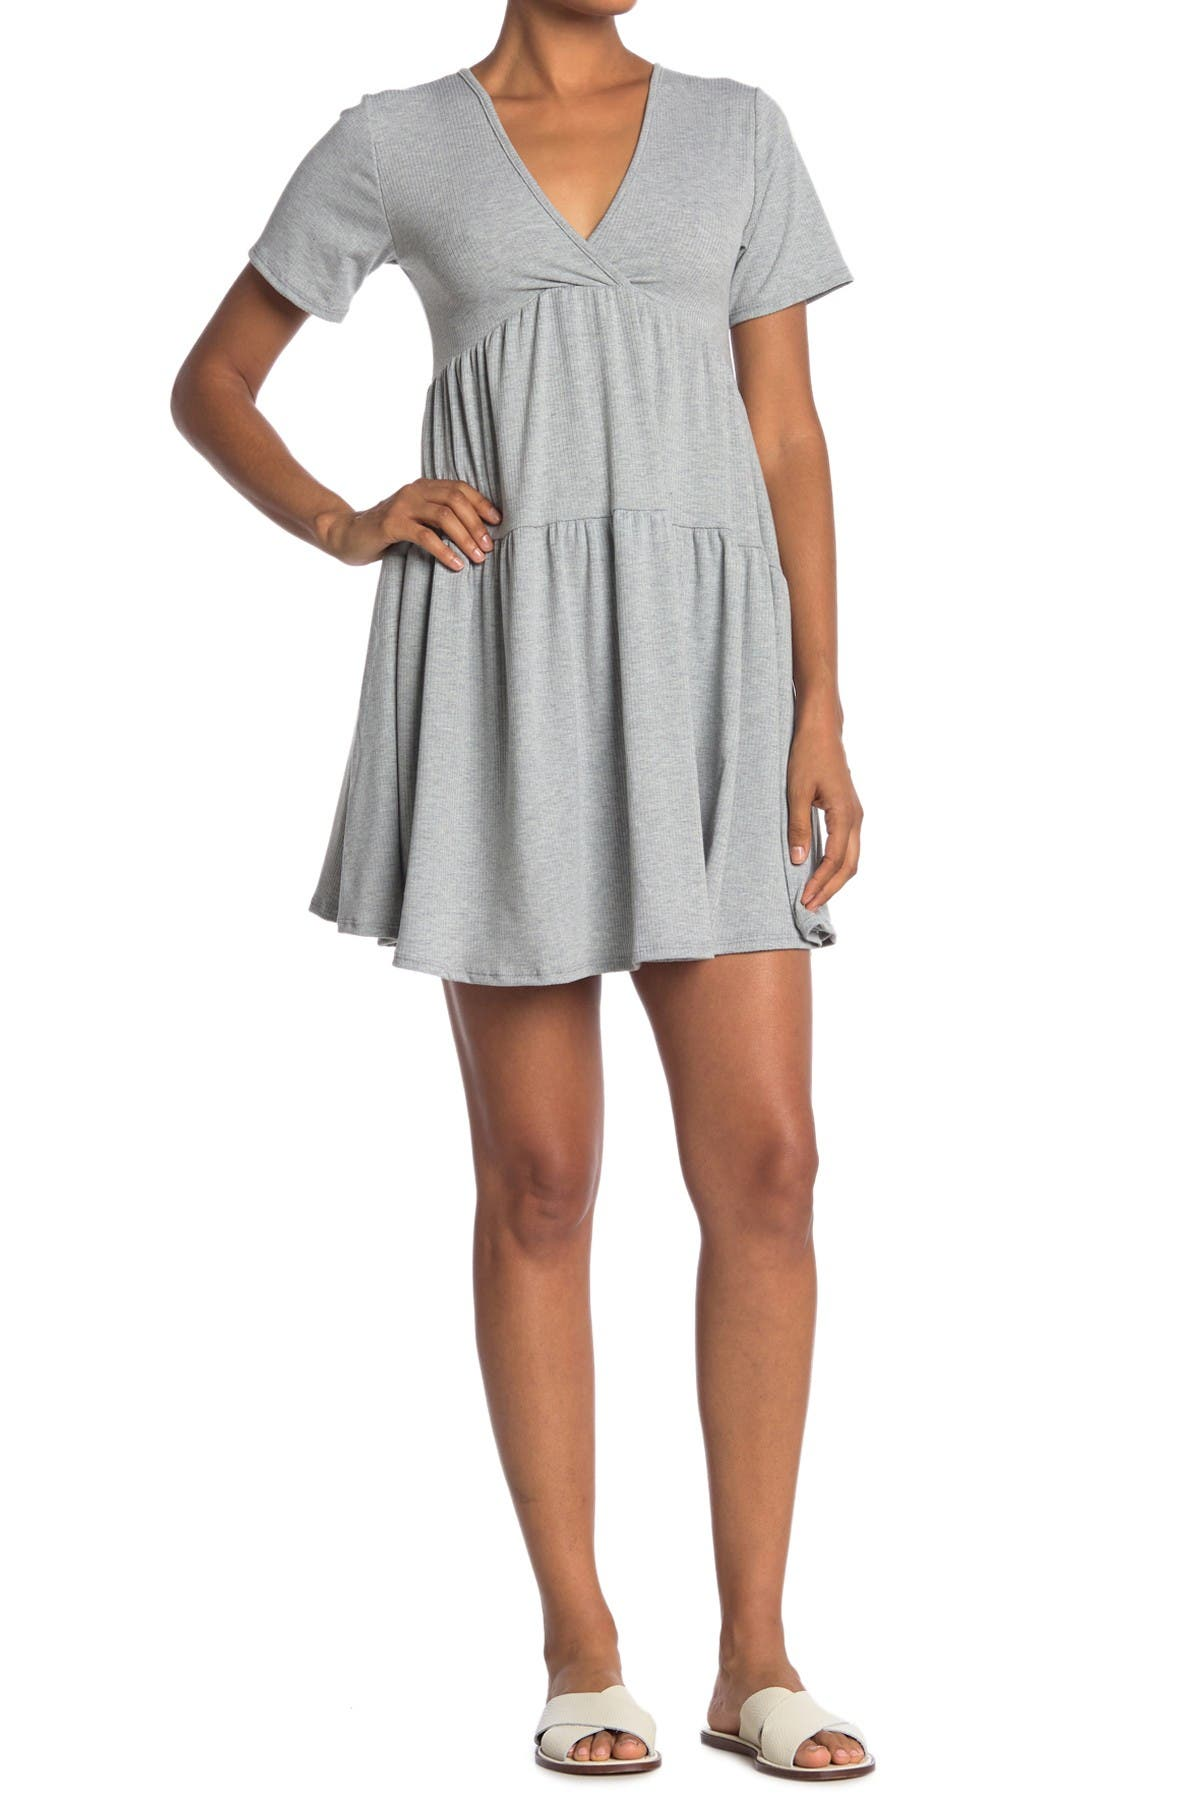 Image of Velvet Torch Tiered V-Neck Knit Dress